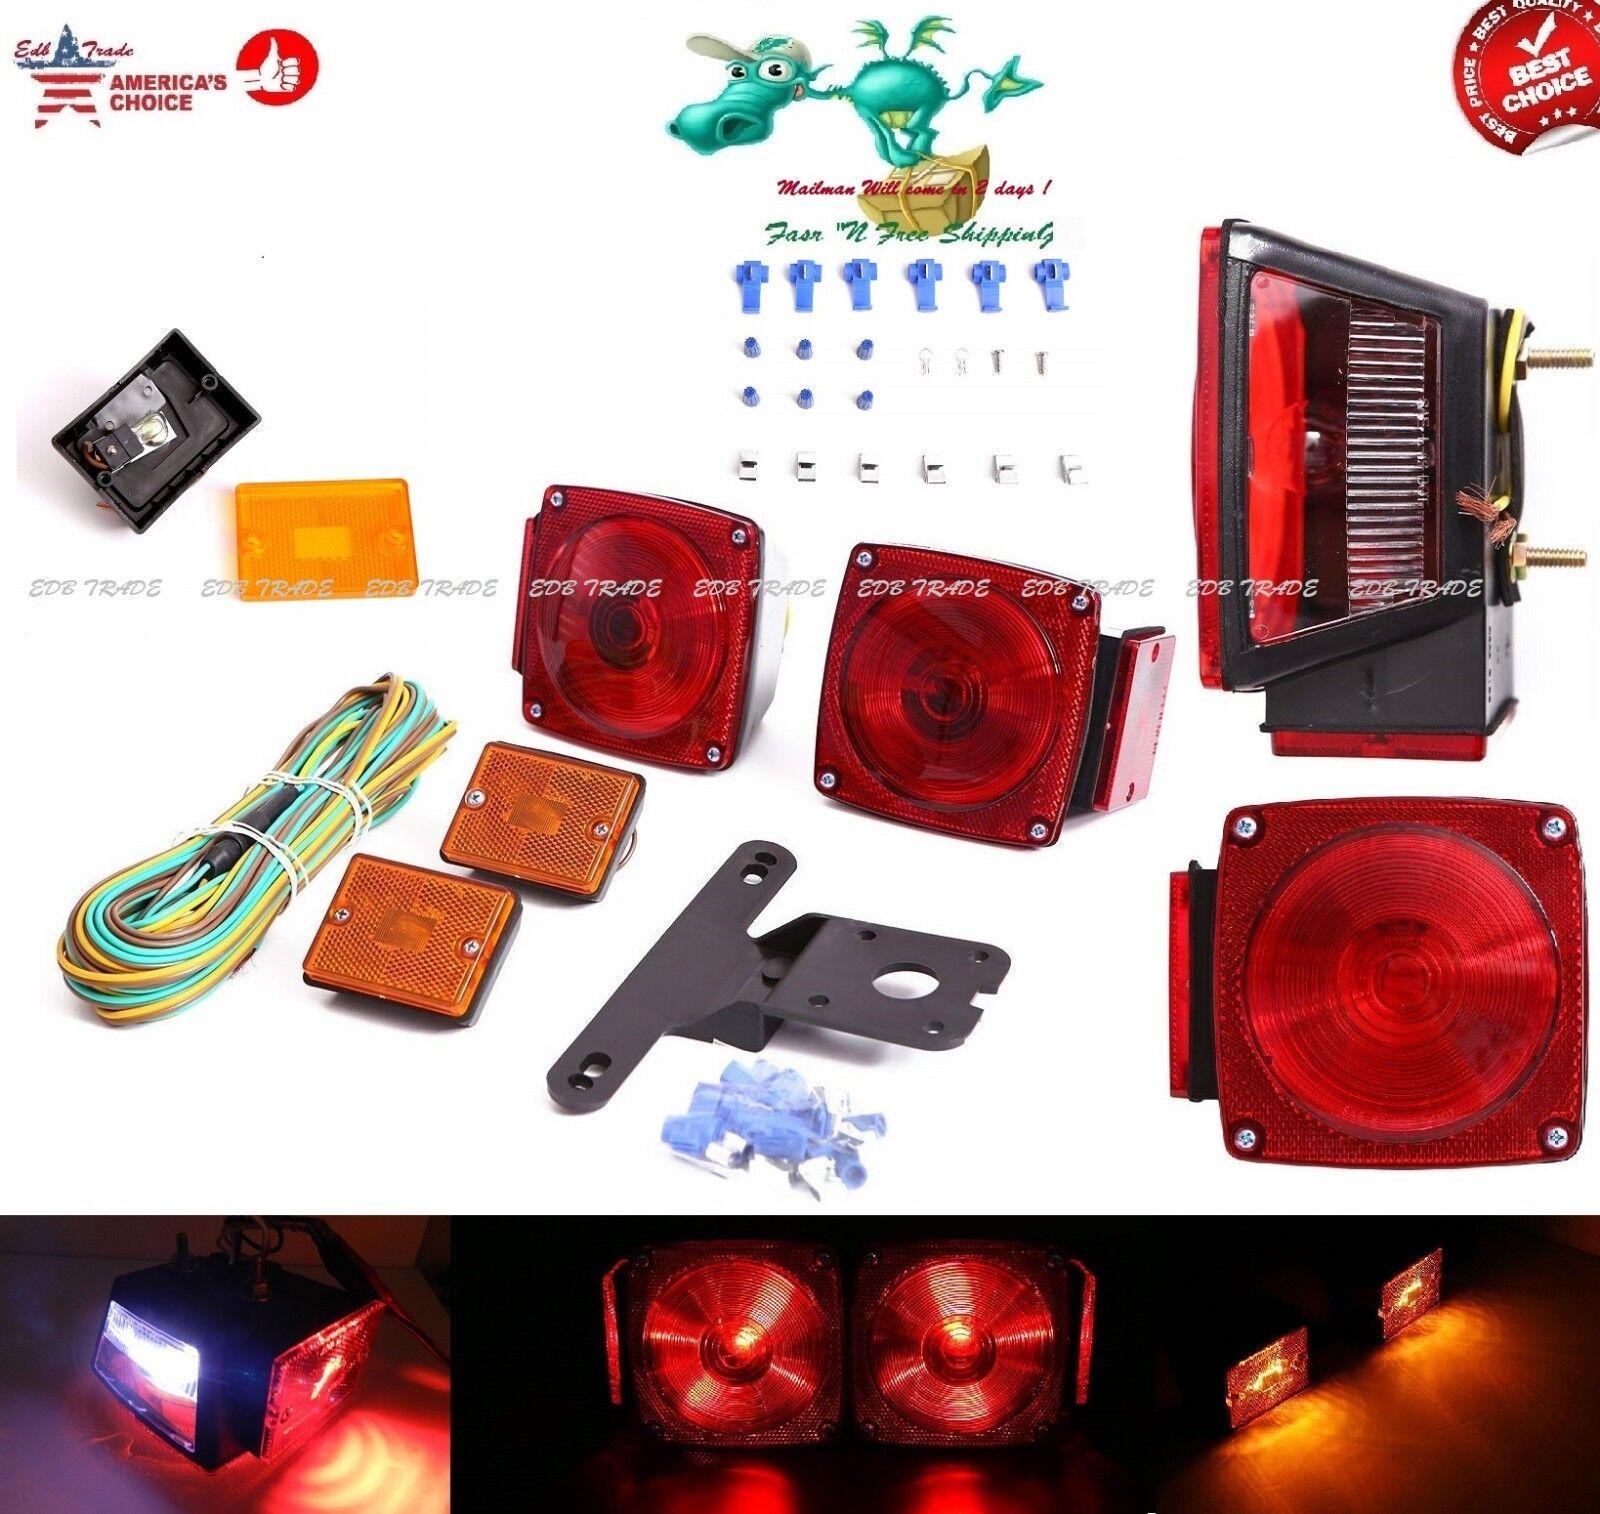 Trailer Lights Set Kit Camper Truck Boat Light Square Rear Tail Stop Waterproof